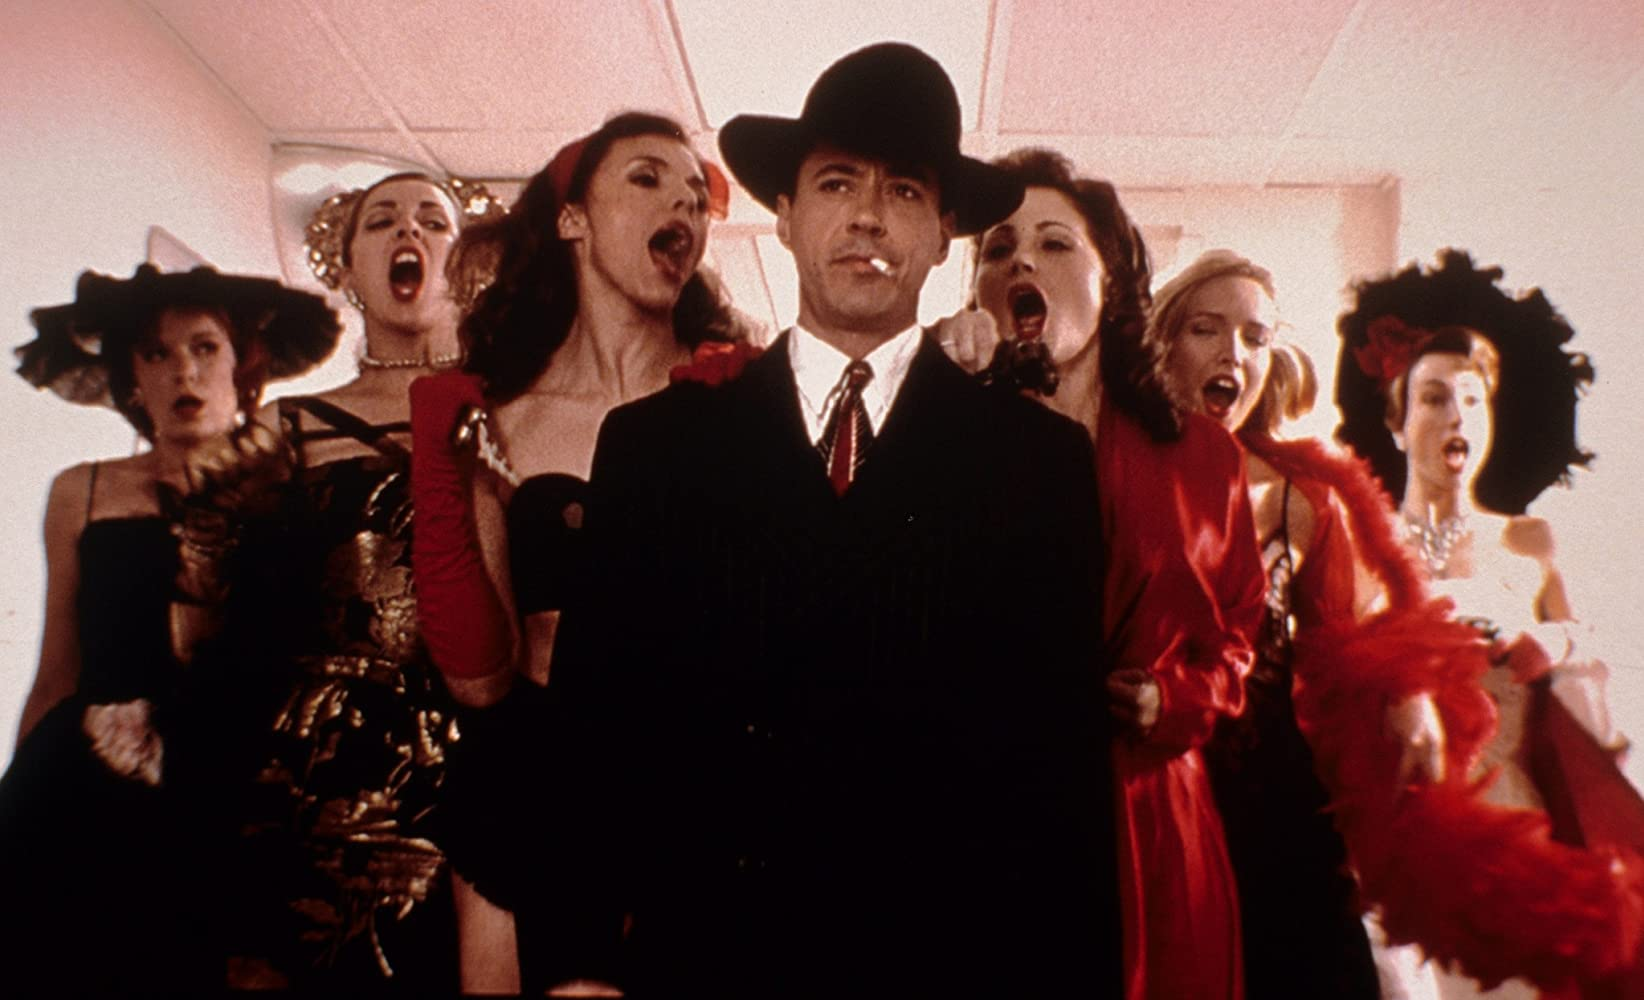 Robert Downey Jr in a 1940s film noir dreamworld in The Singing Detective (2003)